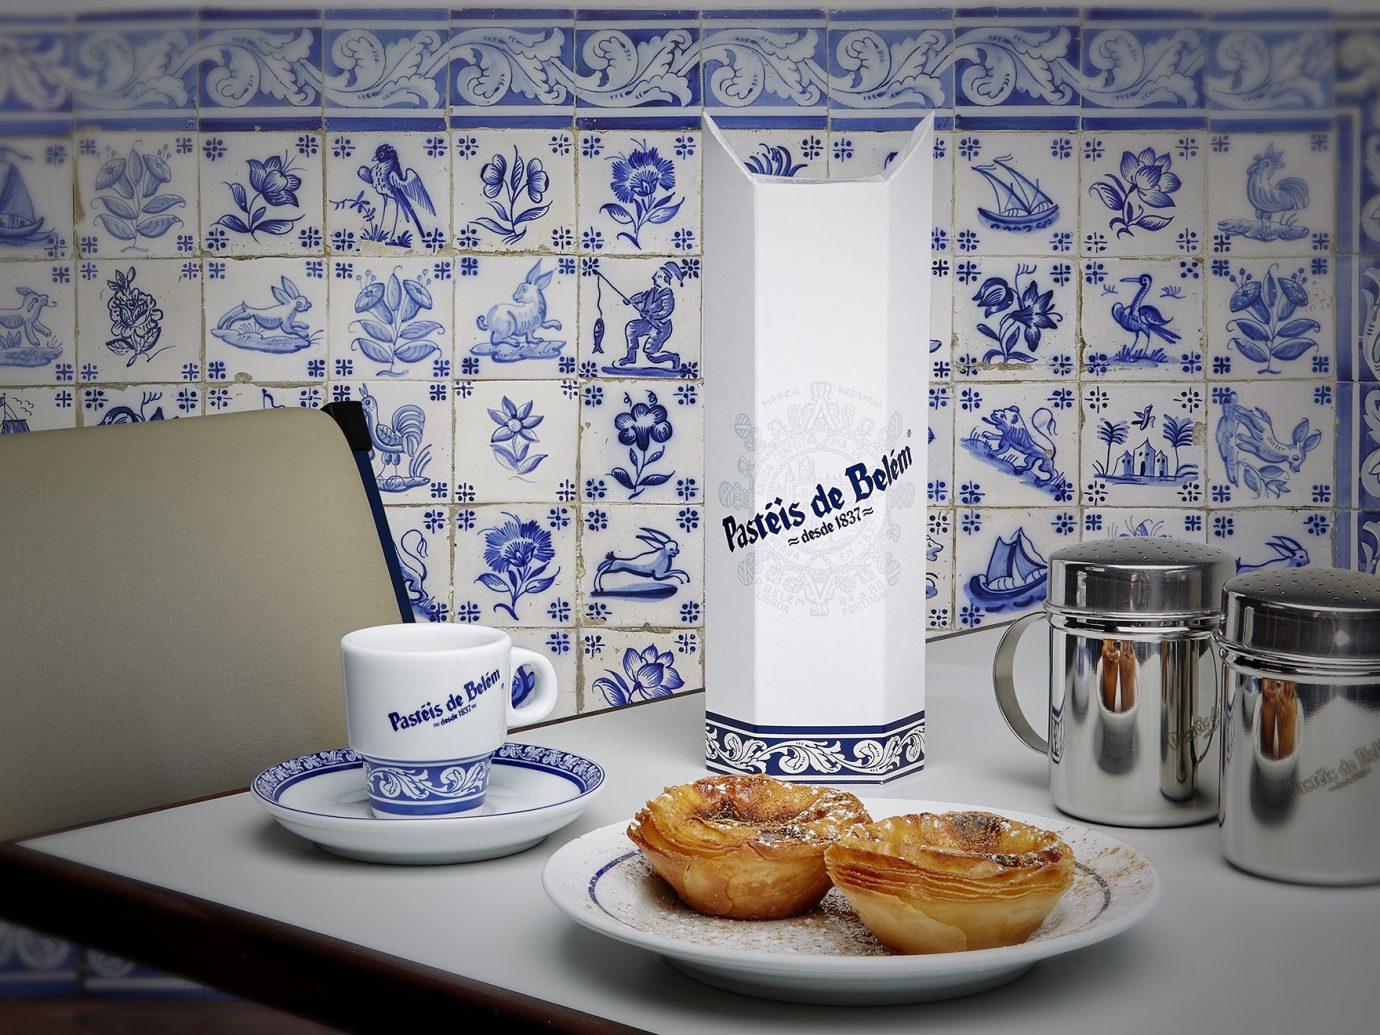 Pastel de Nata on a table at Antiga Confeitaria de Belém, Portuguese blue tiles in the background